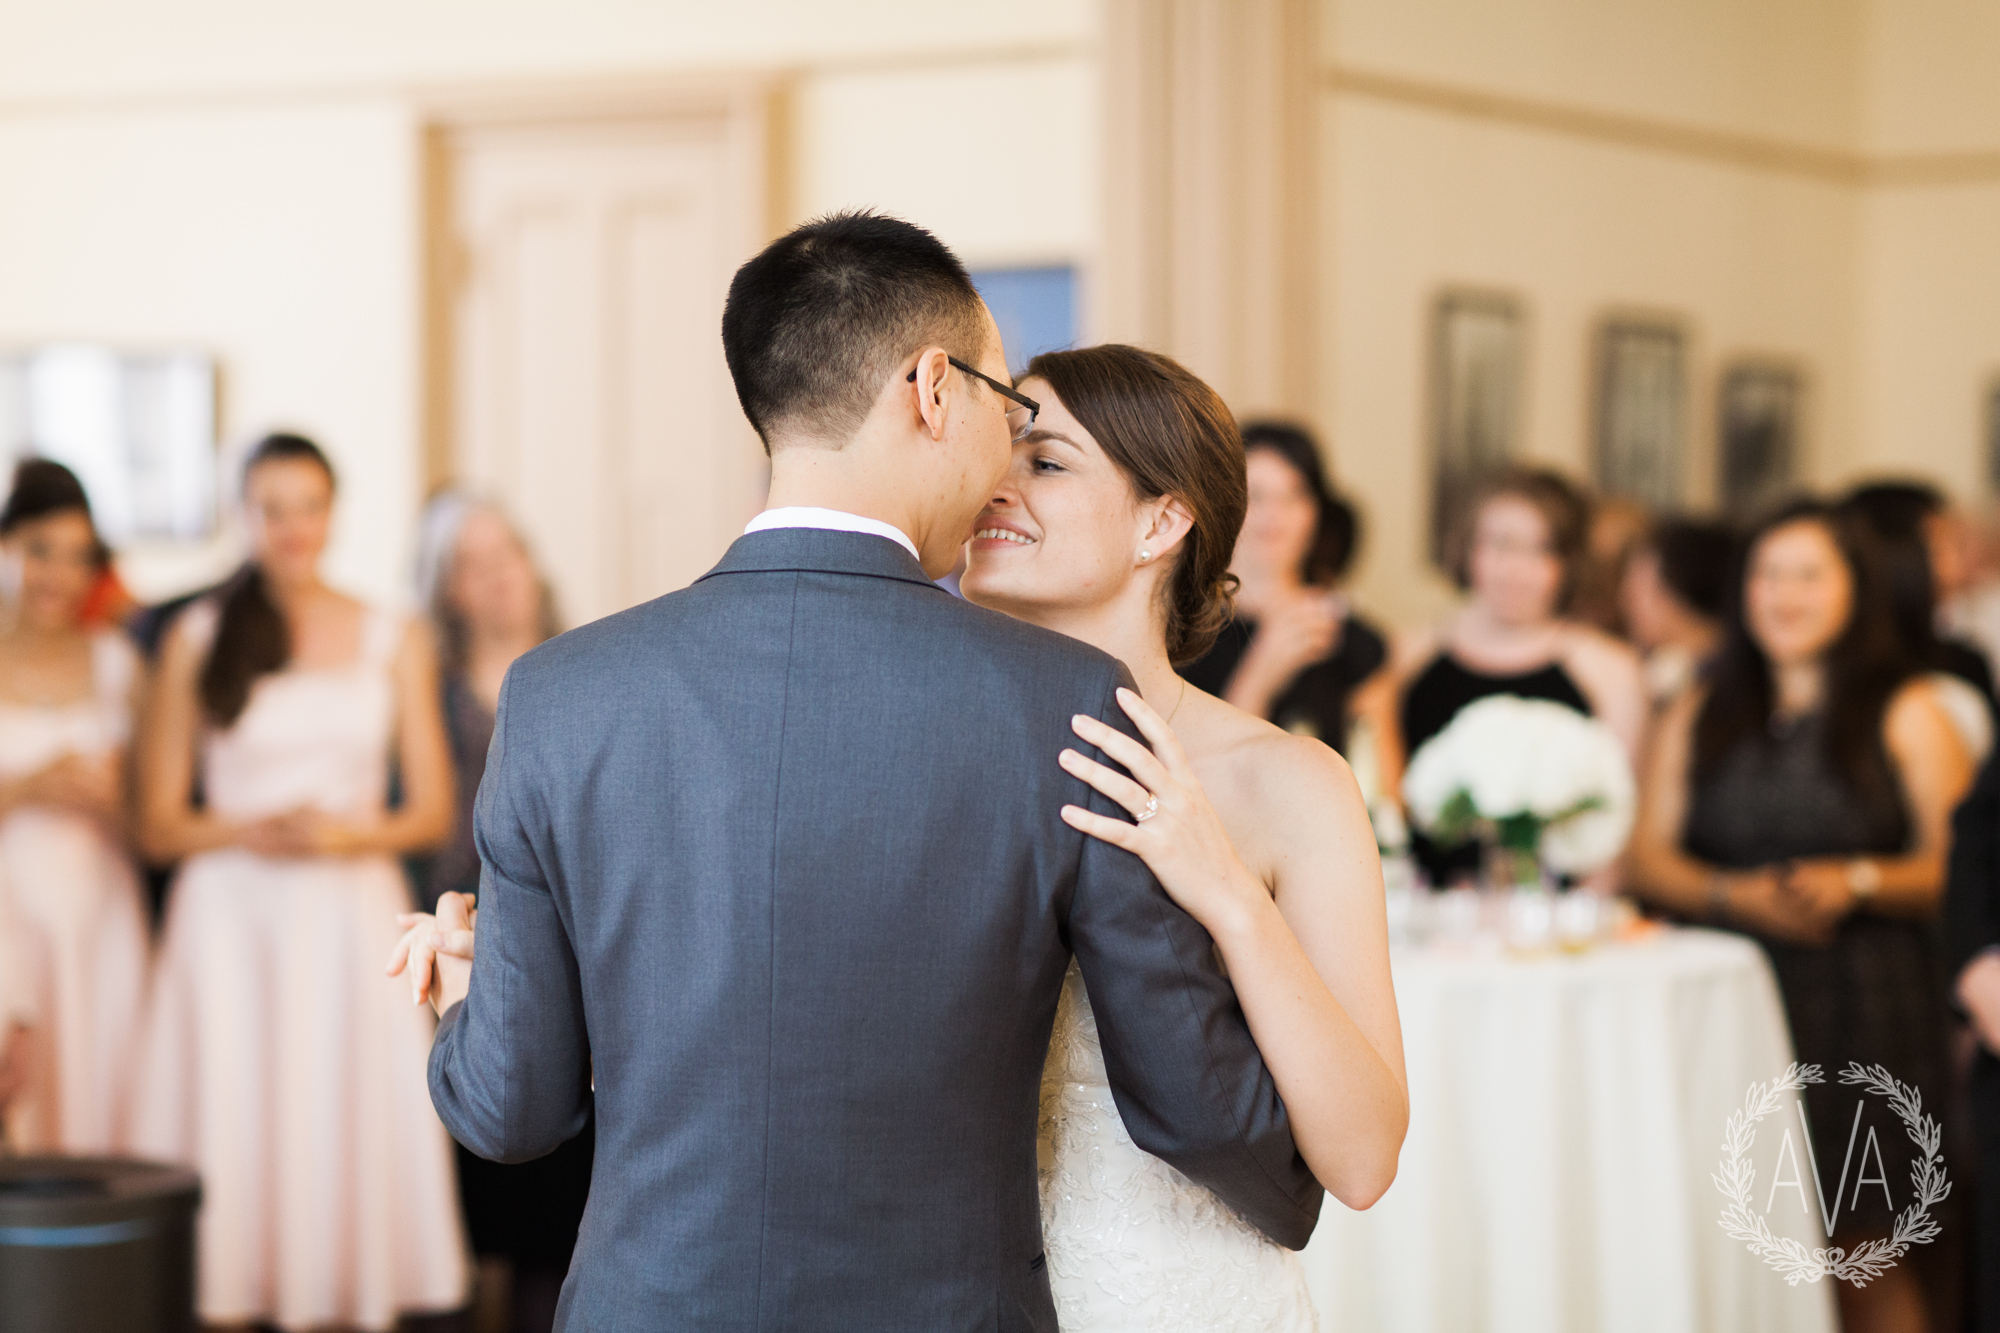 ava_chiew_wedding-63.jpg